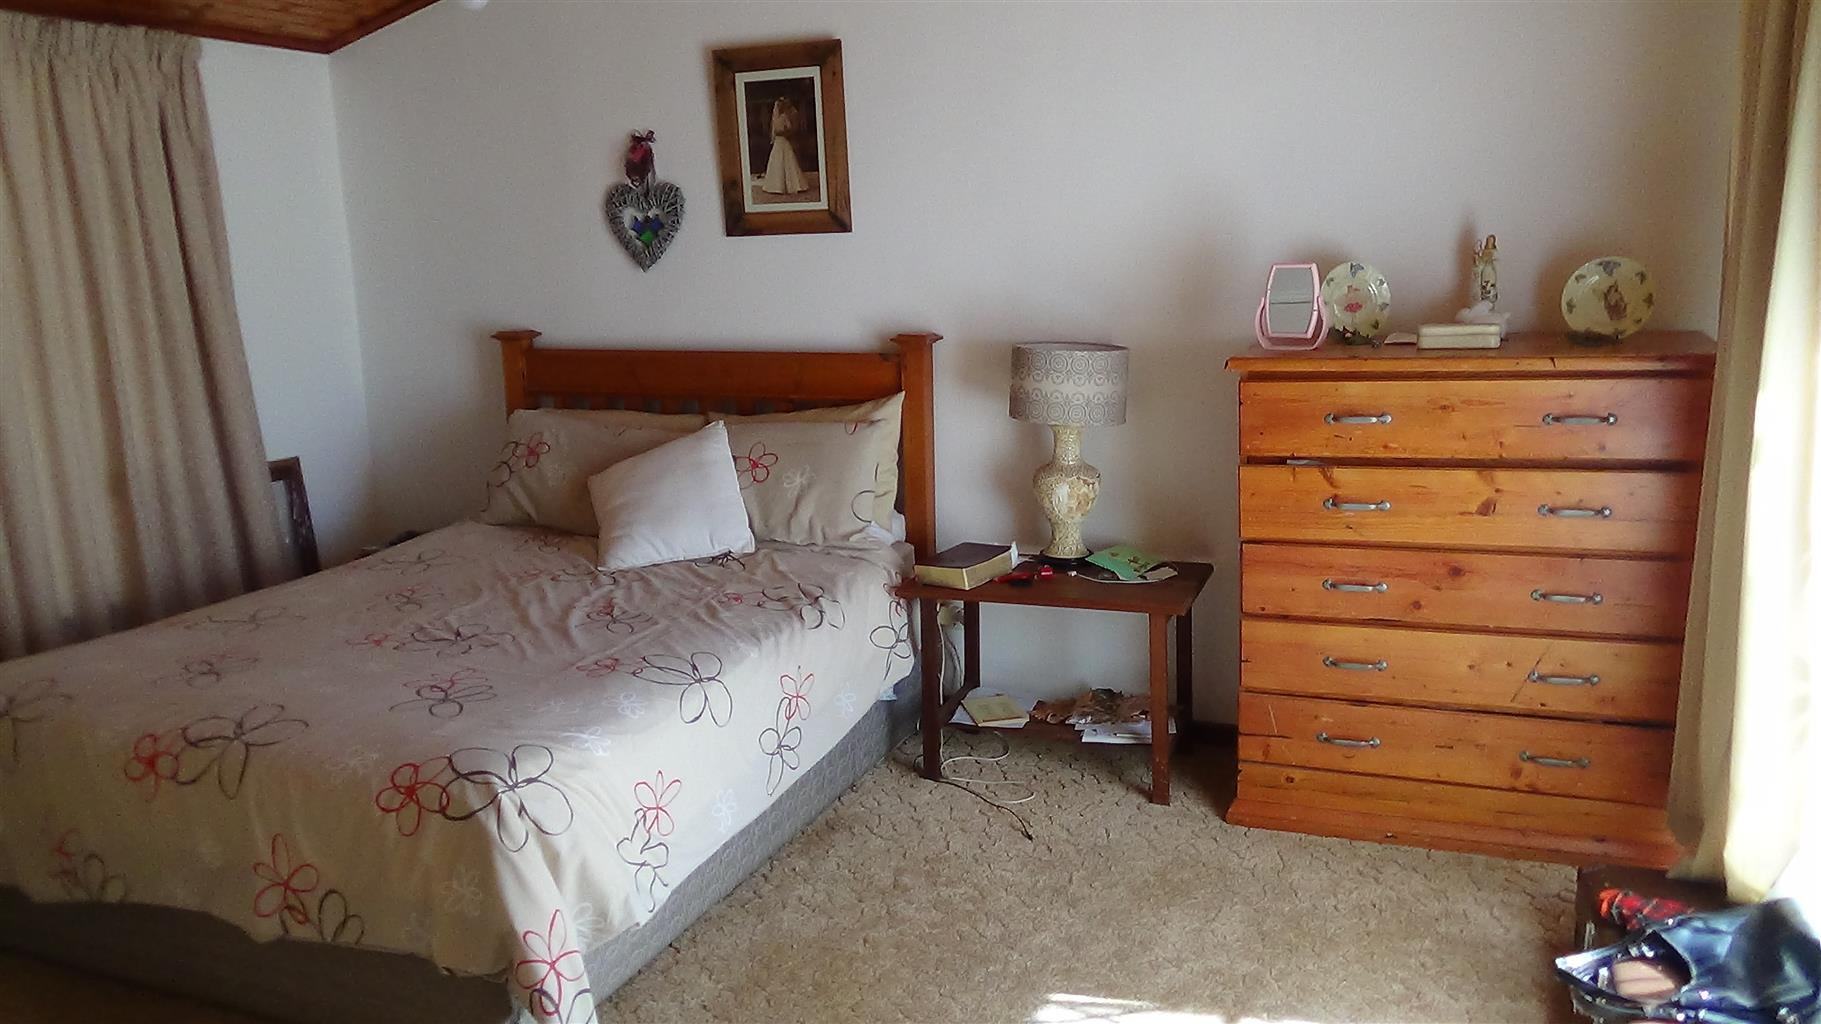 3 Bedroom House in Tileba – R 1 350 000